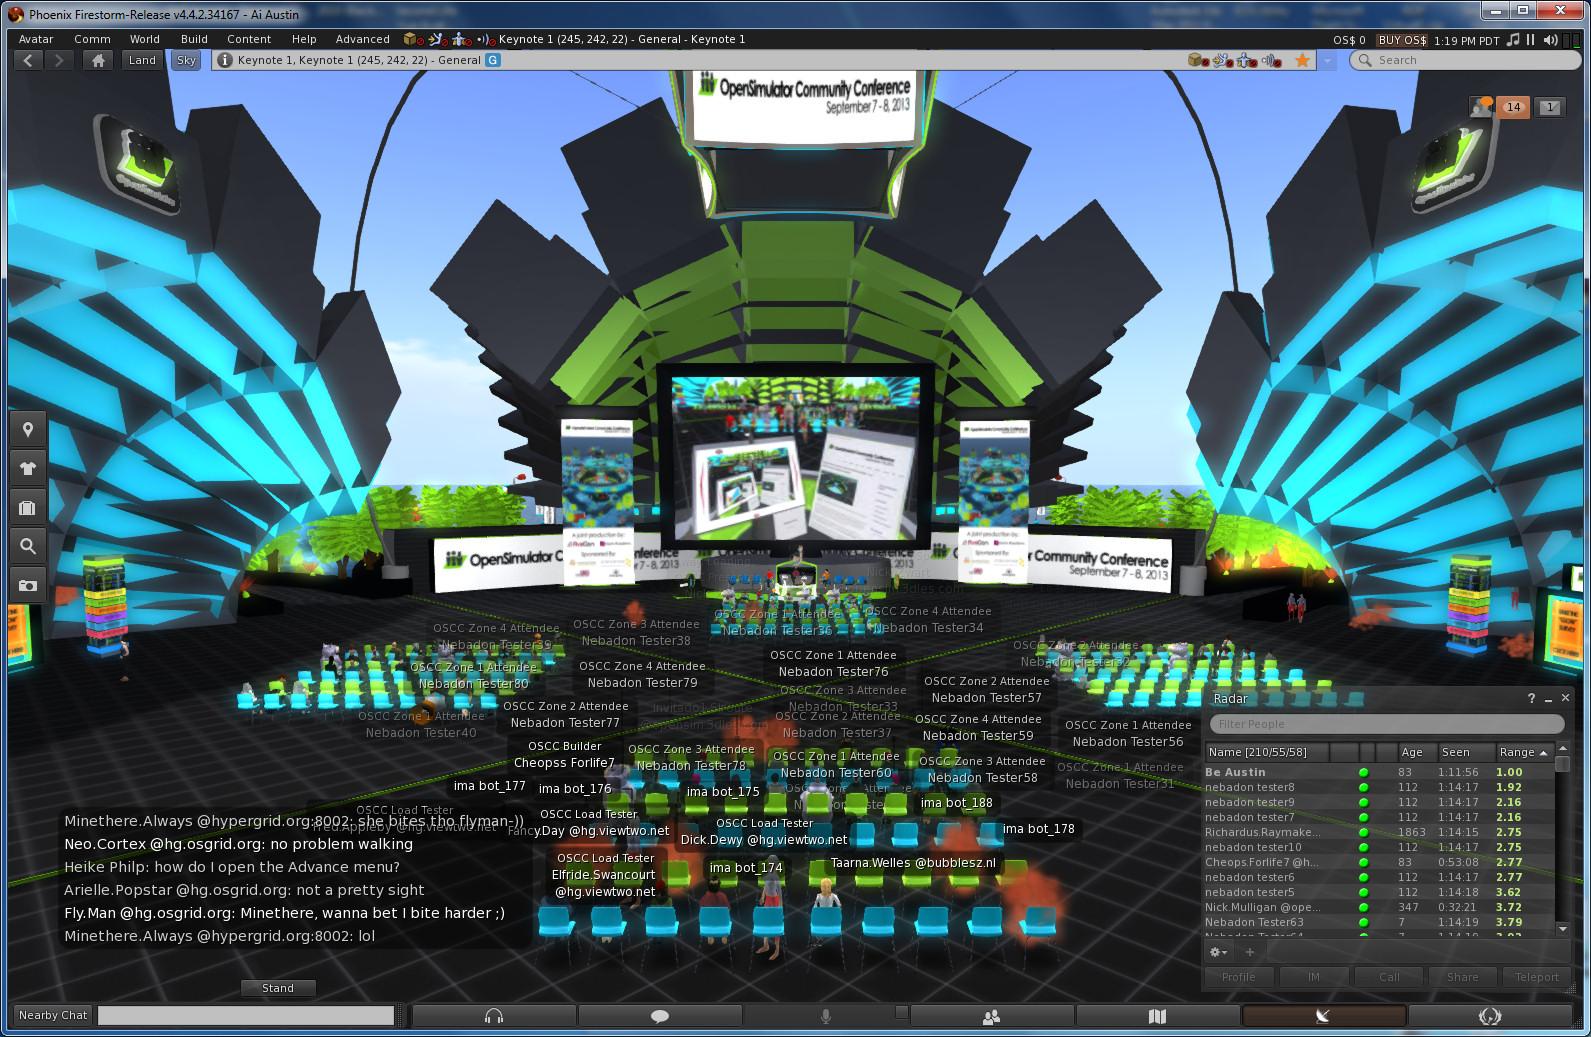 2013-09-02-Load-Test-4-Sim-View